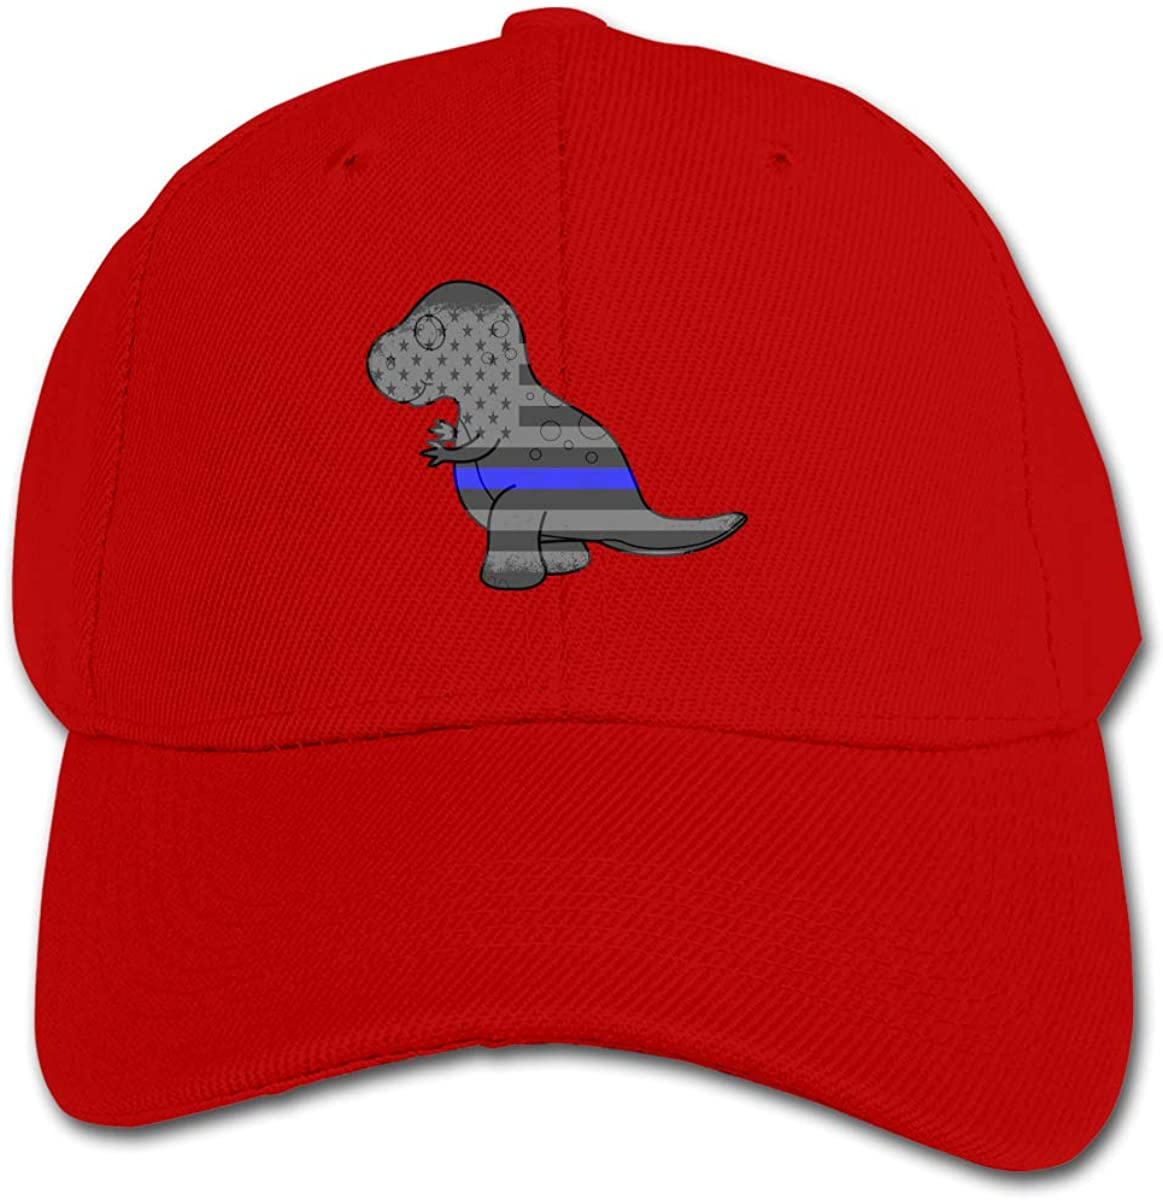 Blue Thin Line American Flag Dinosaur Kids Baseball Cap Hat Unisex Toddler Sun Hat Adsjutable Trucker Hat